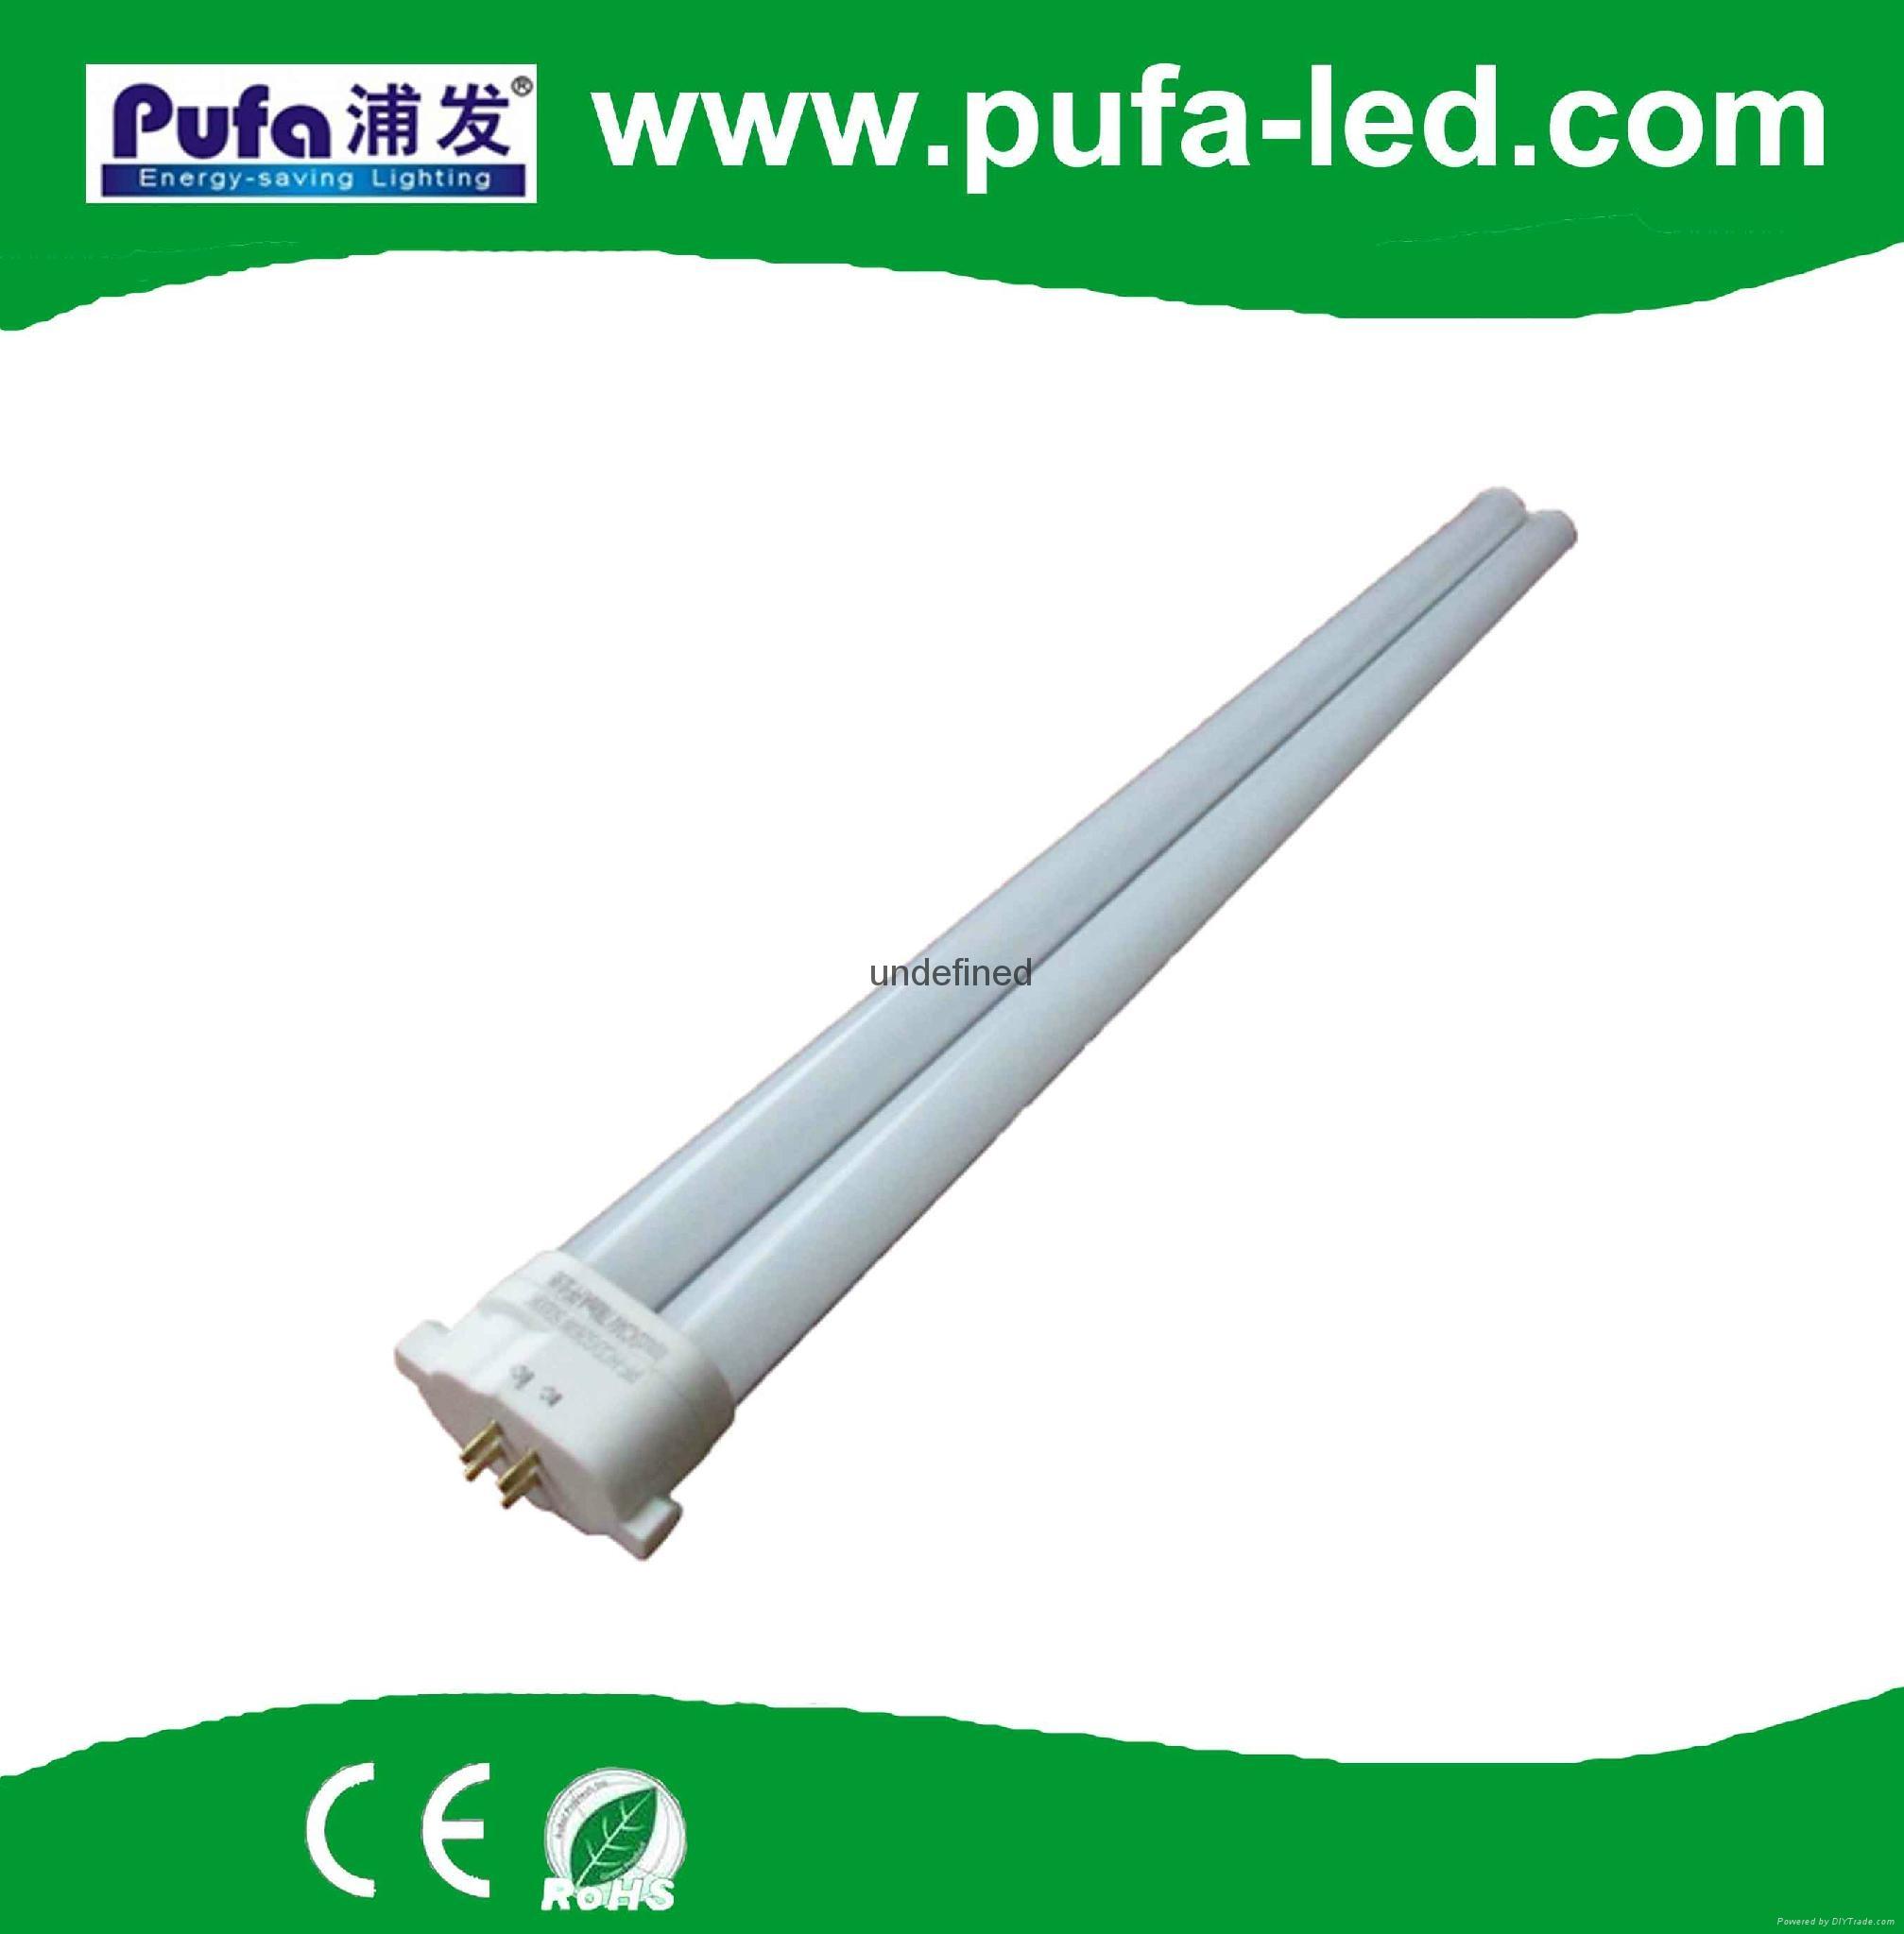 LED GY10Q 横插灯 7W 1